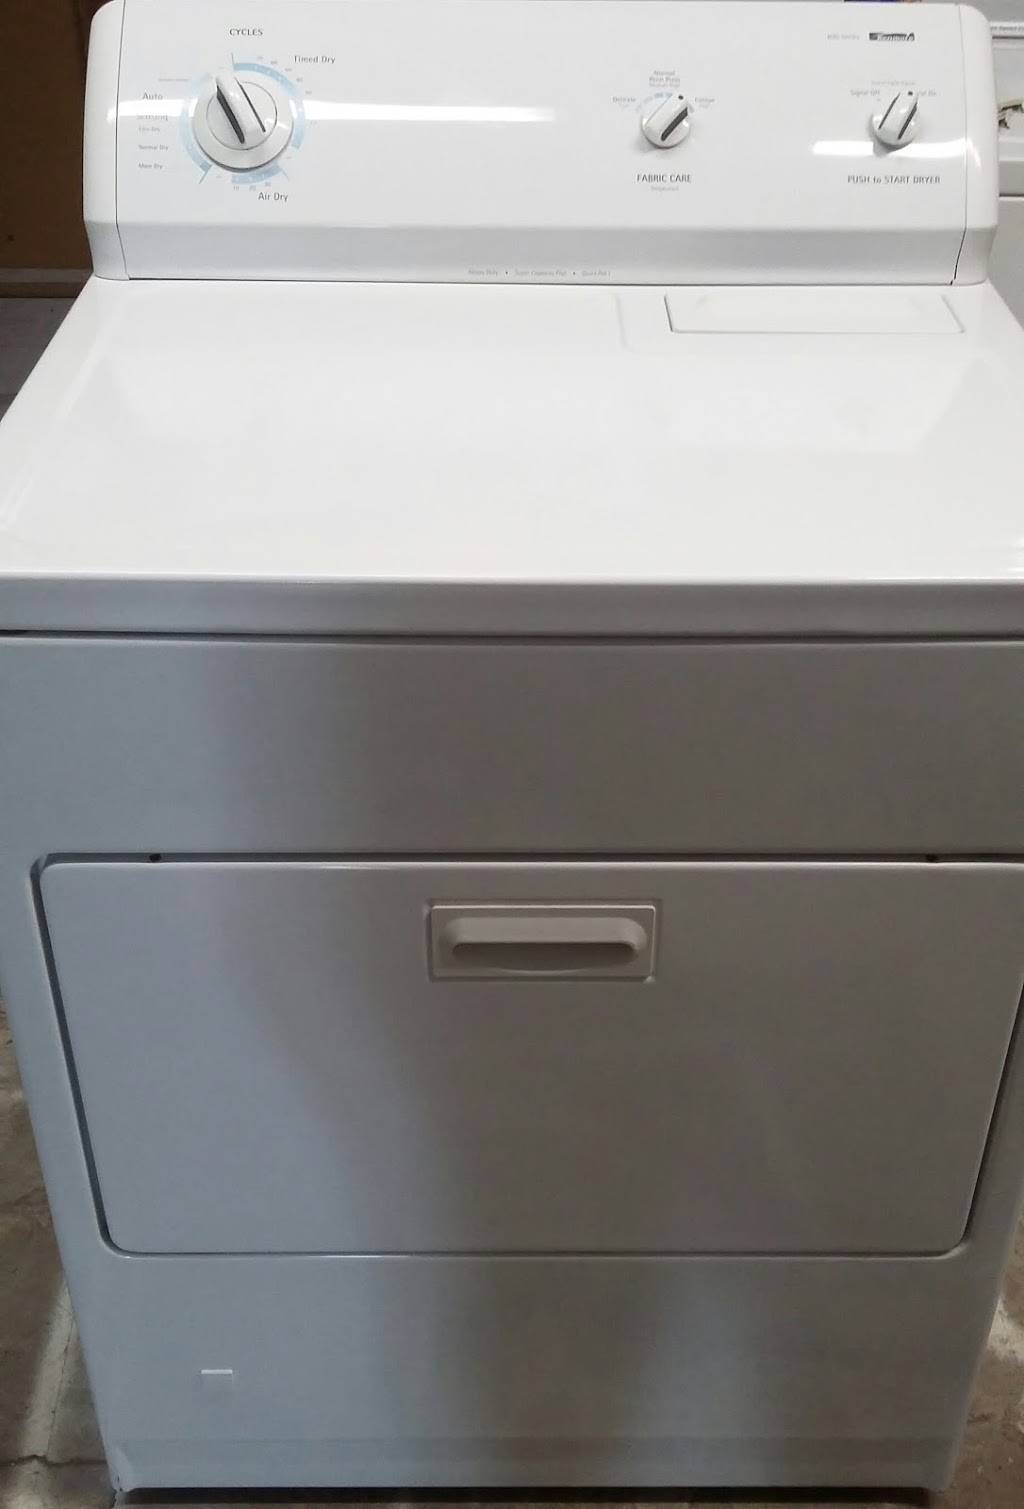 michael's appliances - home goods store  | Photo 4 of 5 | Address: 2214 Nogalitos St, San Antonio, TX 78225, USA | Phone: (210) 789-1483